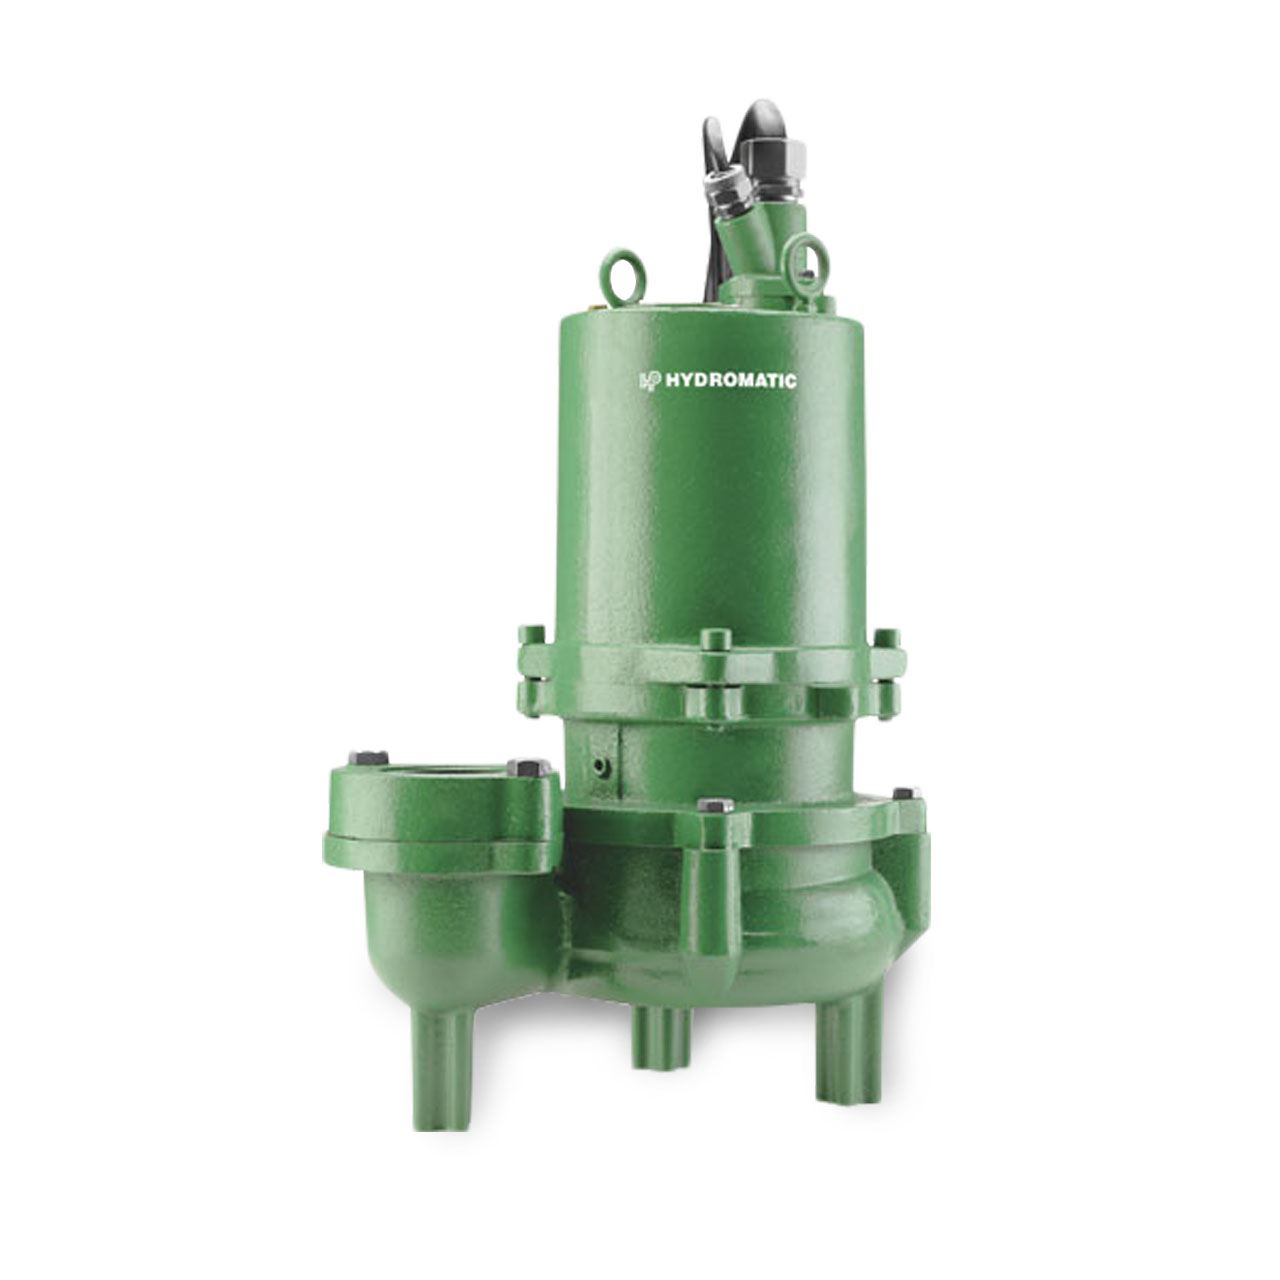 hight resolution of hydromatic pump wiring diagram wiring diagram third level myers pump wiring diagram hydromatic pump hydromatic sb4sd500m2